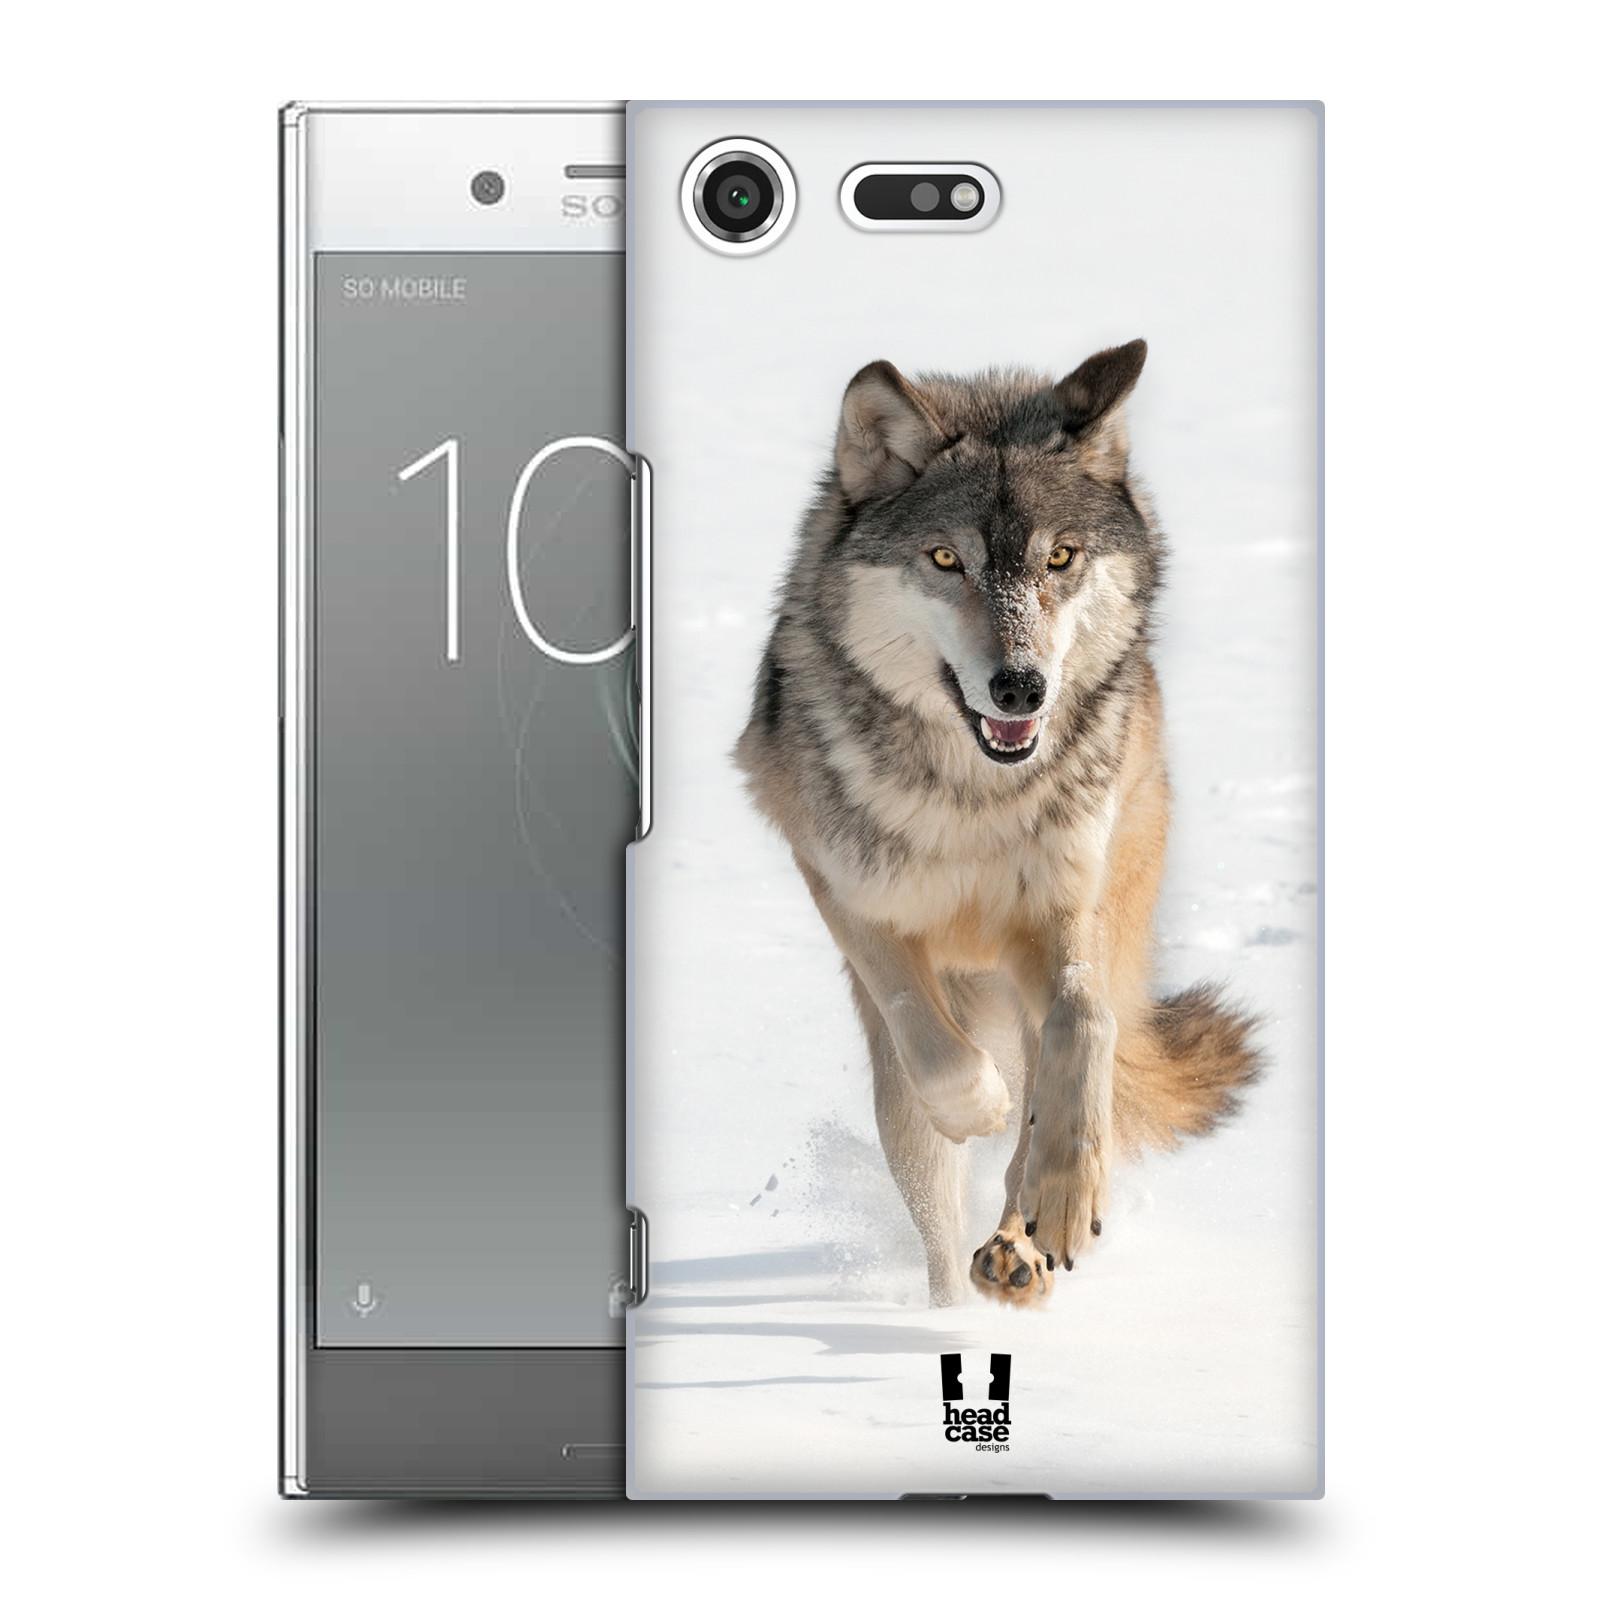 Plastové pouzdro na mobil Sony Xperia XZ Premium Head Case - DIVOČINA - VLK (Plastový kryt či obal na mobilní telefon Sony Xperia XZ Premium G8142)